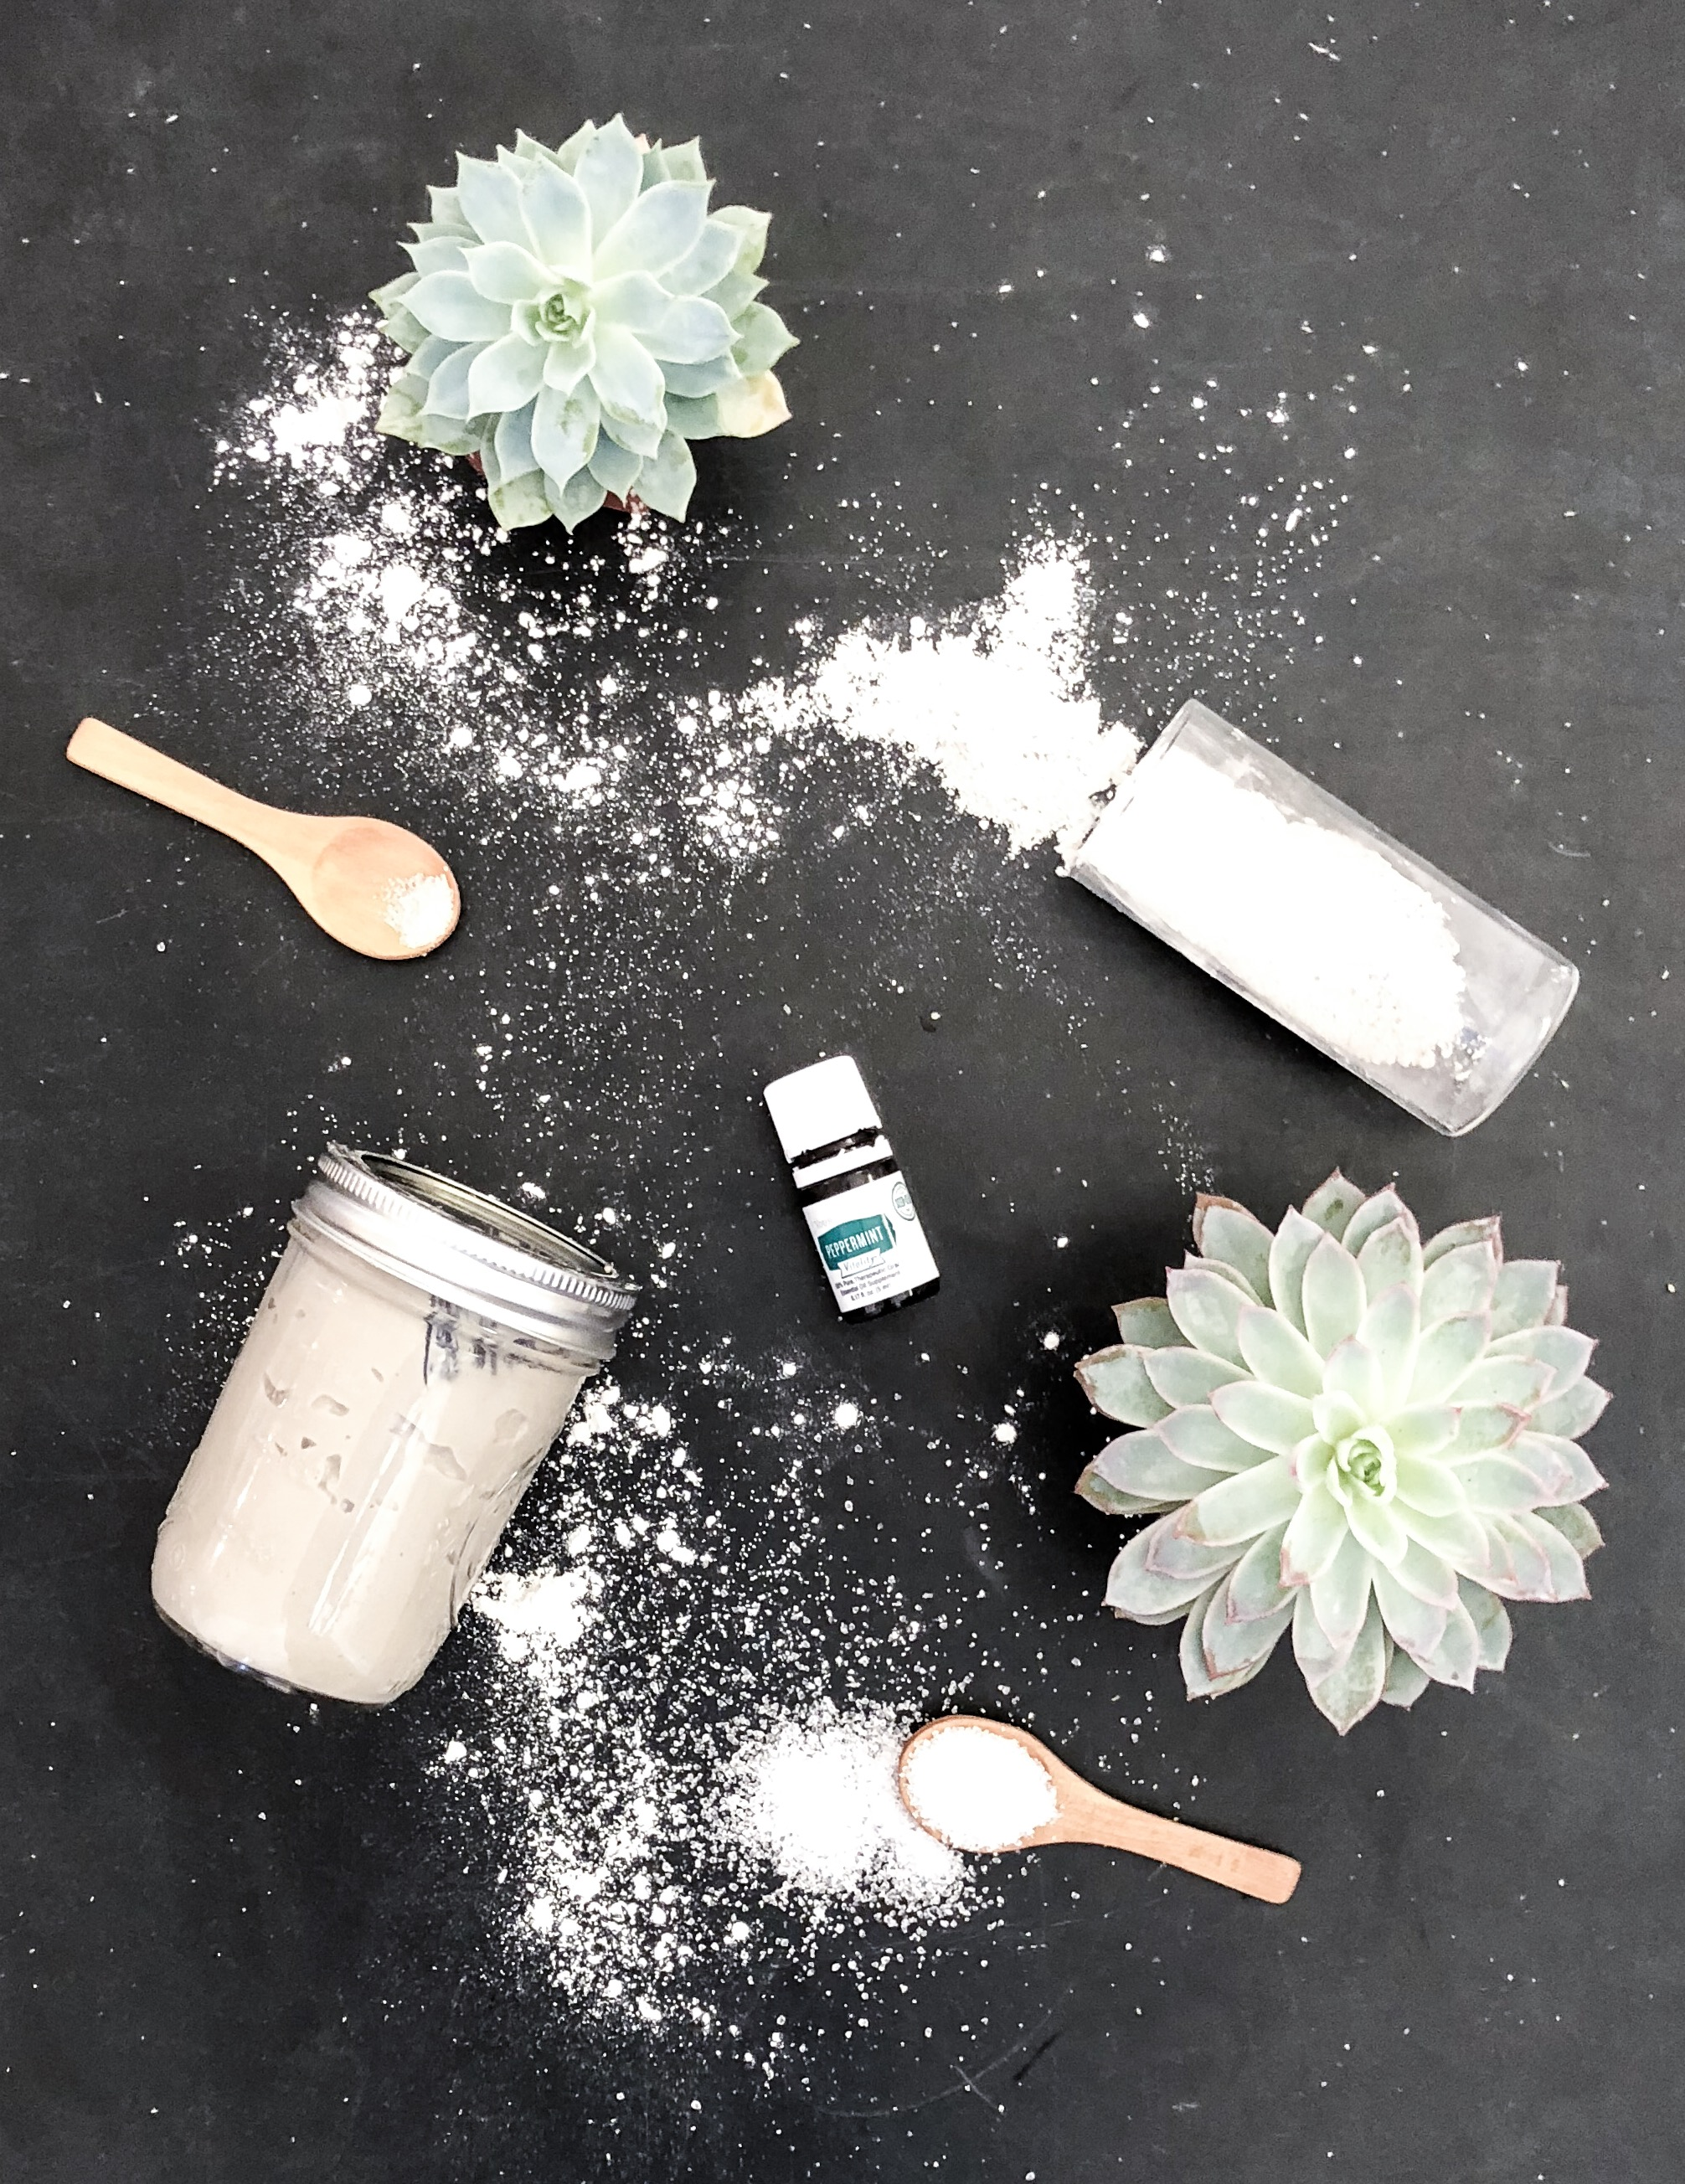 peppermint bentonite clay toothpaste